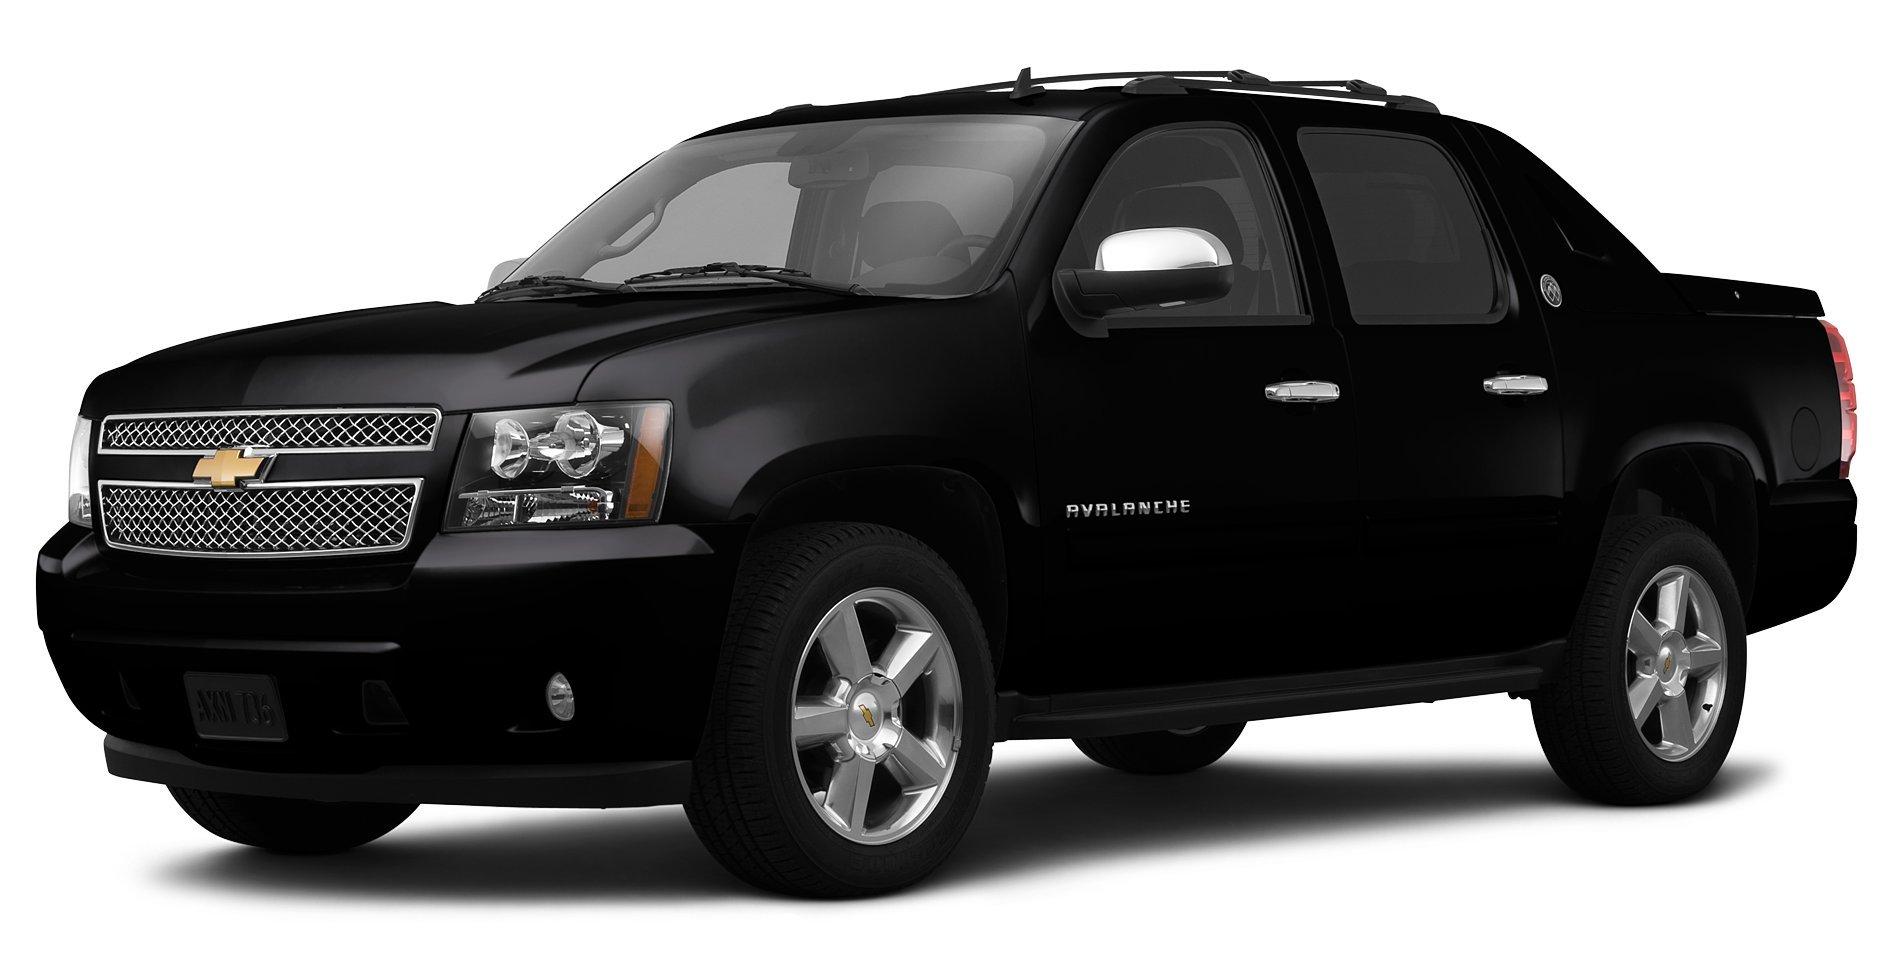 Chevrolet Avalanche II 2006 - 2013 Pickup #7